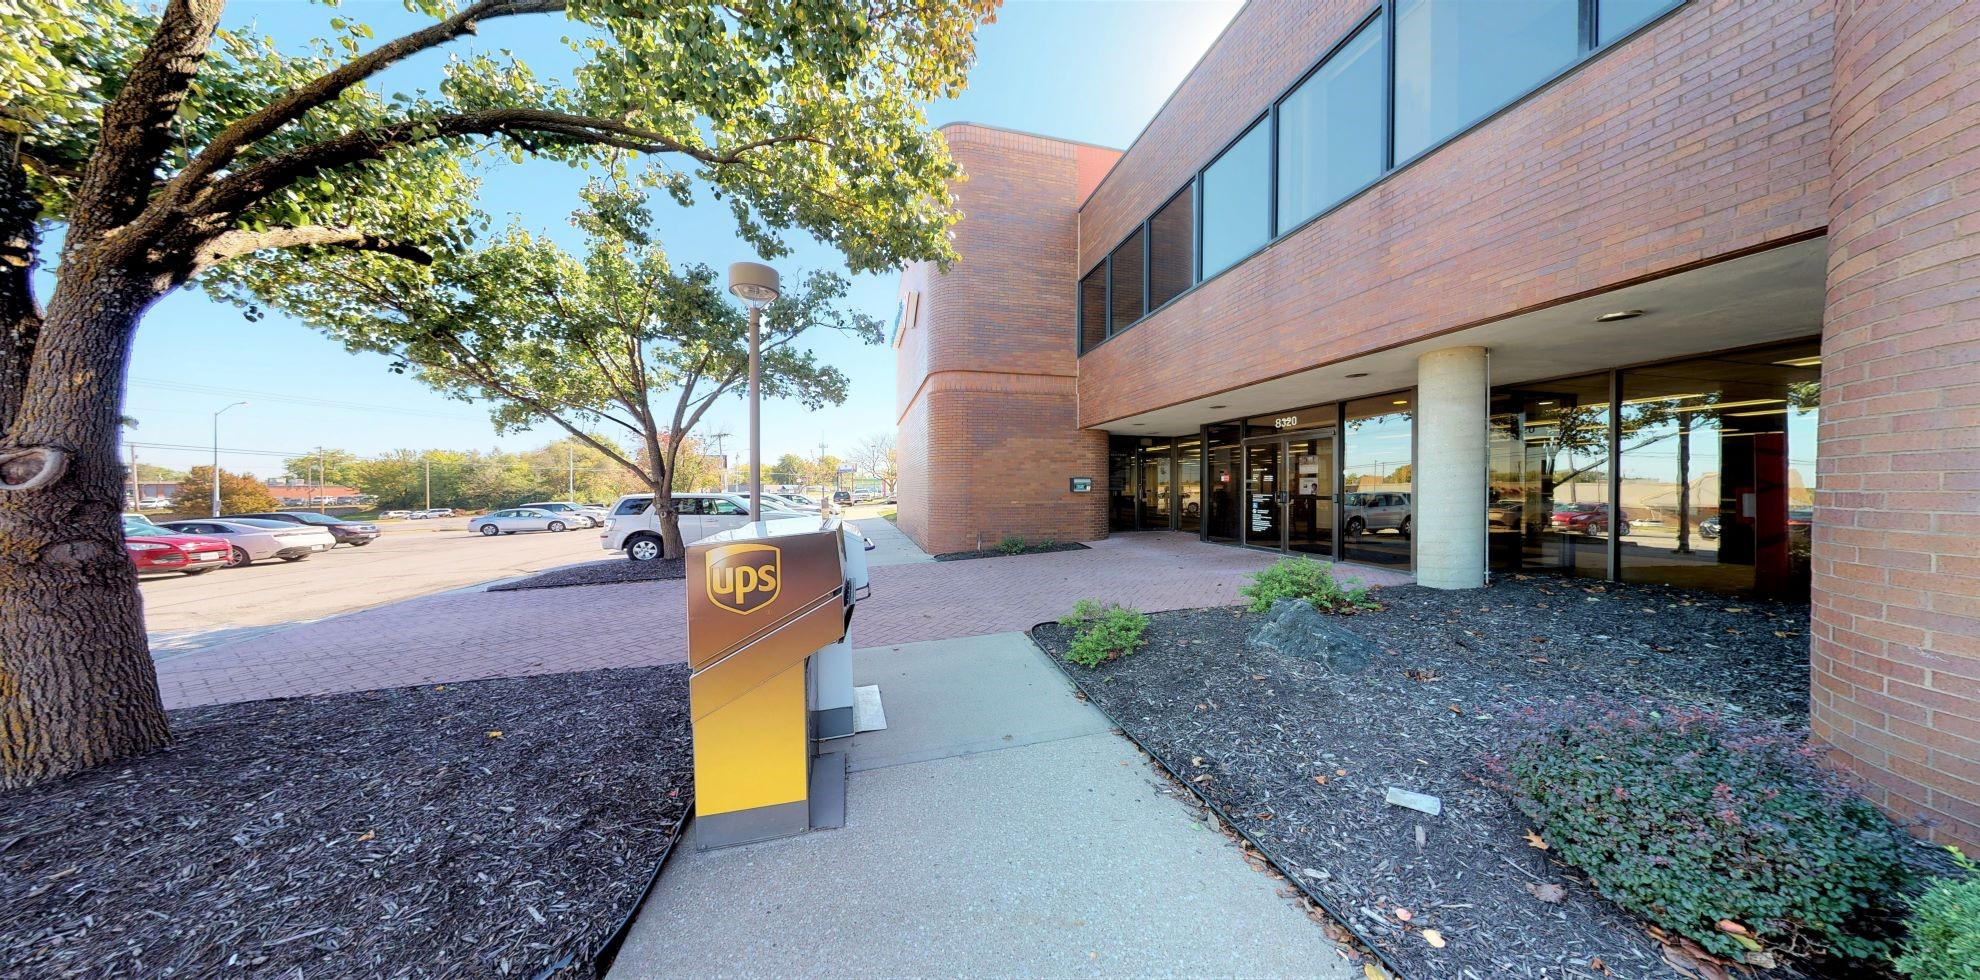 Bank of America financial center with drive-thru ATM   8320 N Oak Trfy, Kansas City, MO 64118